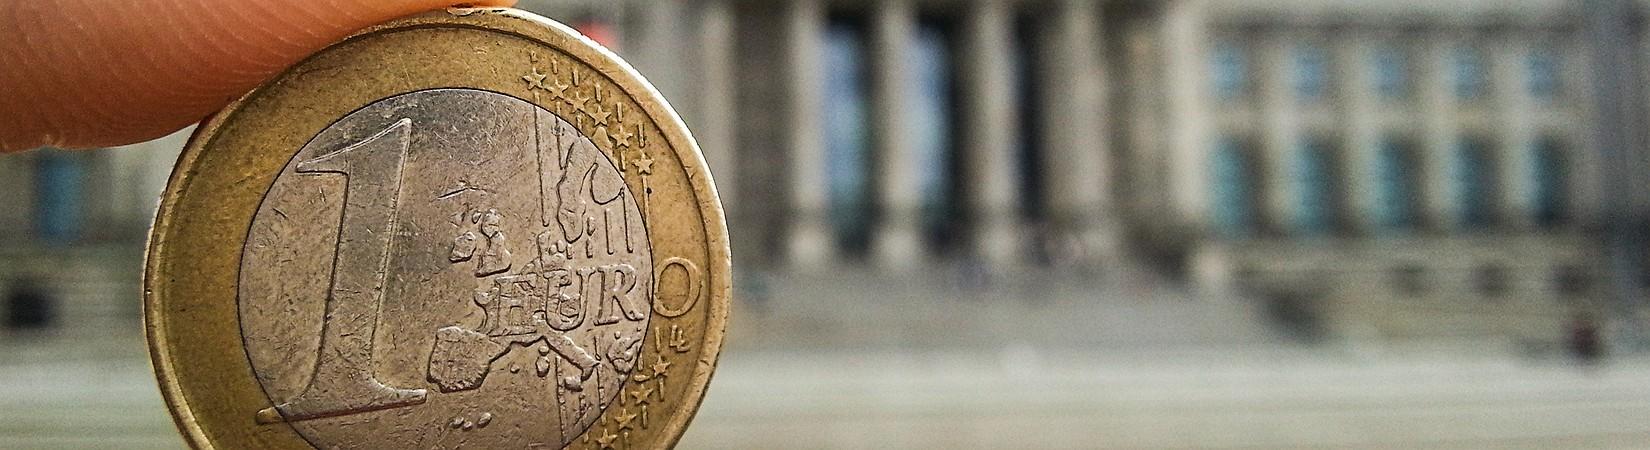 Eurozona, l'inflazione cresce a dicembre